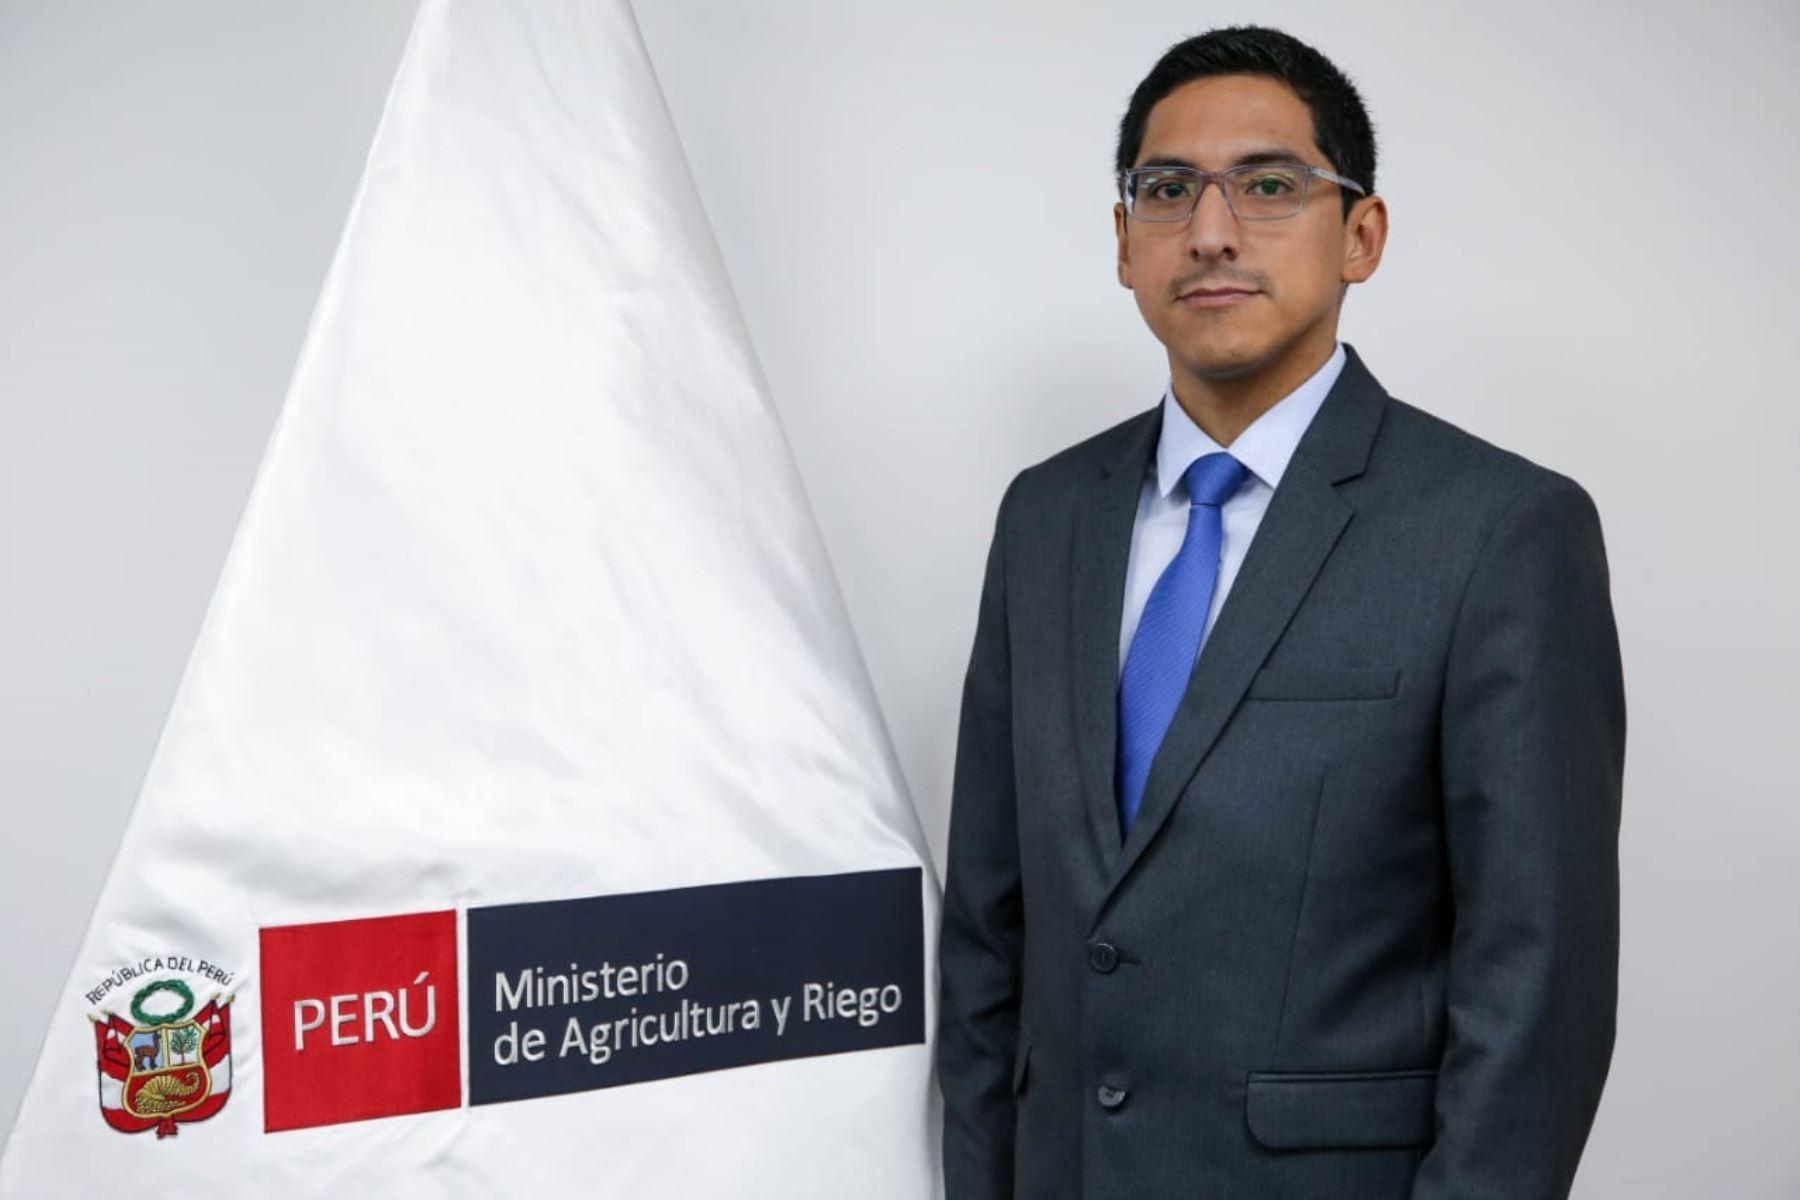 Viceministro de Desarrollo e Infraestructura Agraria y Riego, Carlos Alberto Ynga La Plata.